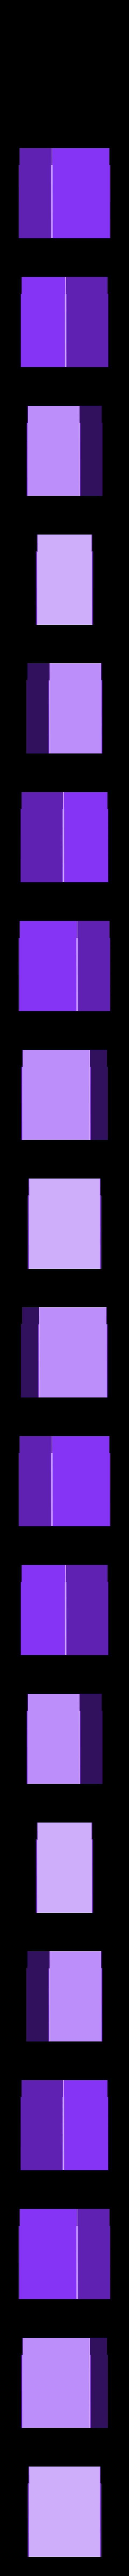 bottom_half.STL Download free STL file Triple Deck Box • 3D print model, Bolrod